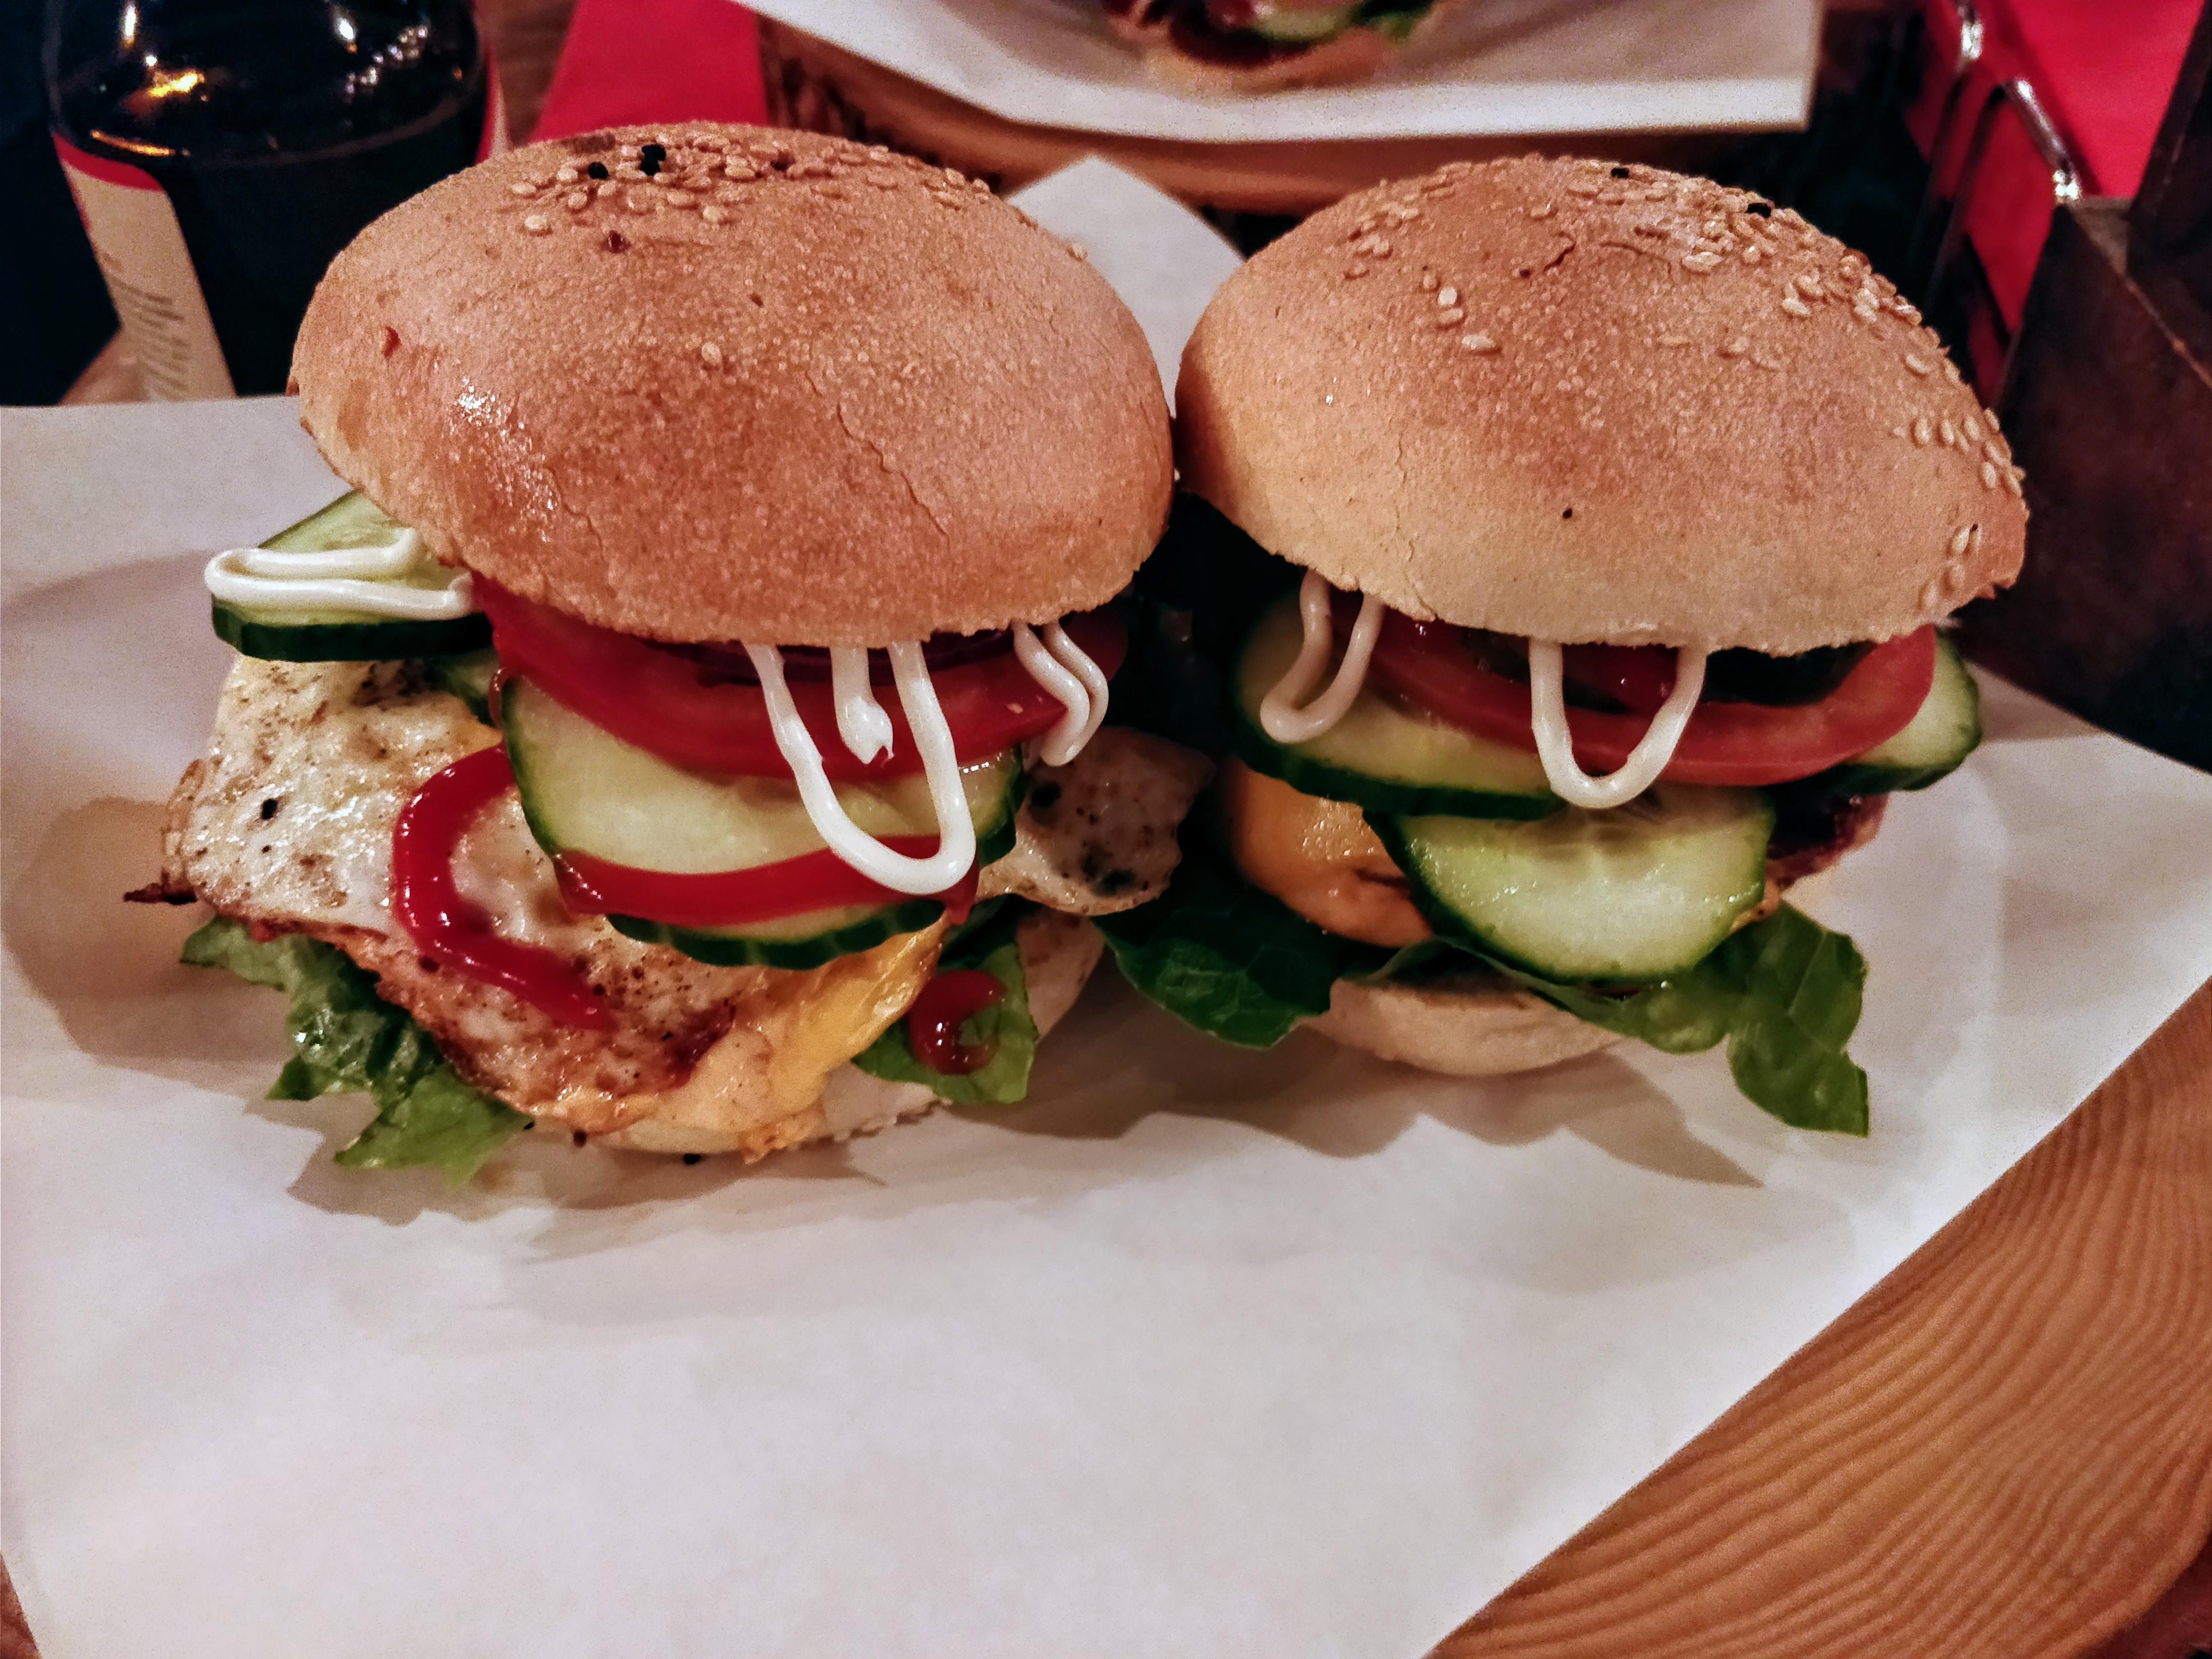 https://foodloader.net/nico_2017-10-06_barbecueburger-und-cheggburger.jpg